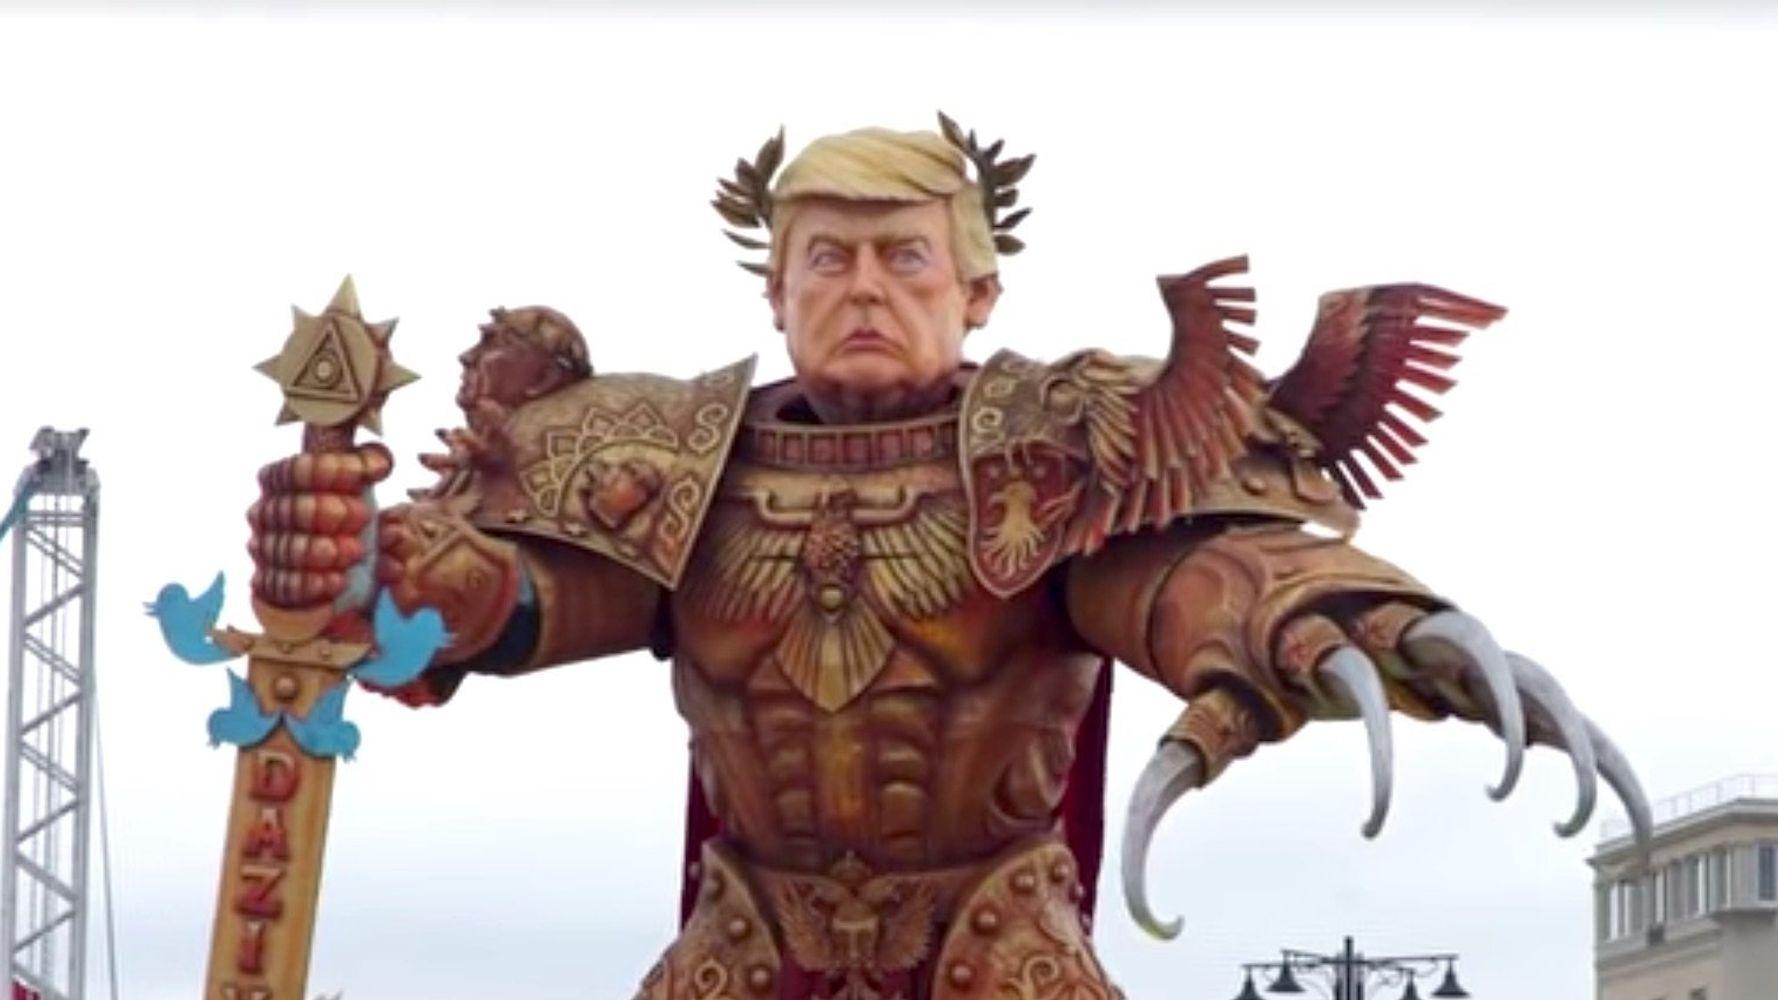 Massive And Terrifying 'God Emperor Trump' Presides Over